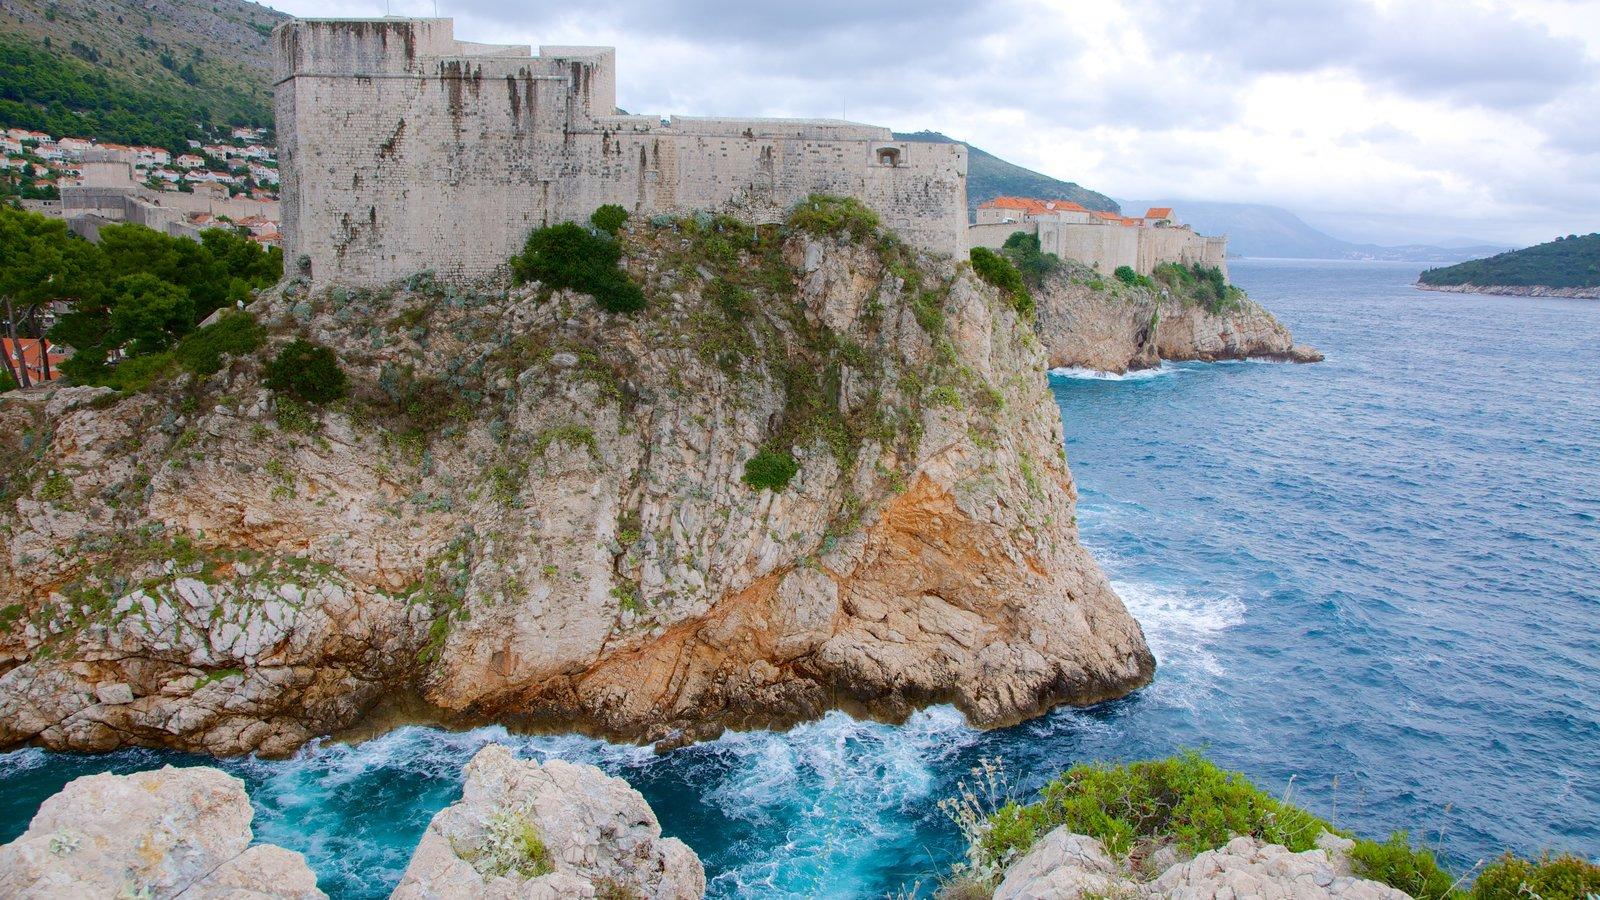 Fortaleza de Lovrijenac caracterizando litoral rochoso, paisagens litorâneas e uma ruína